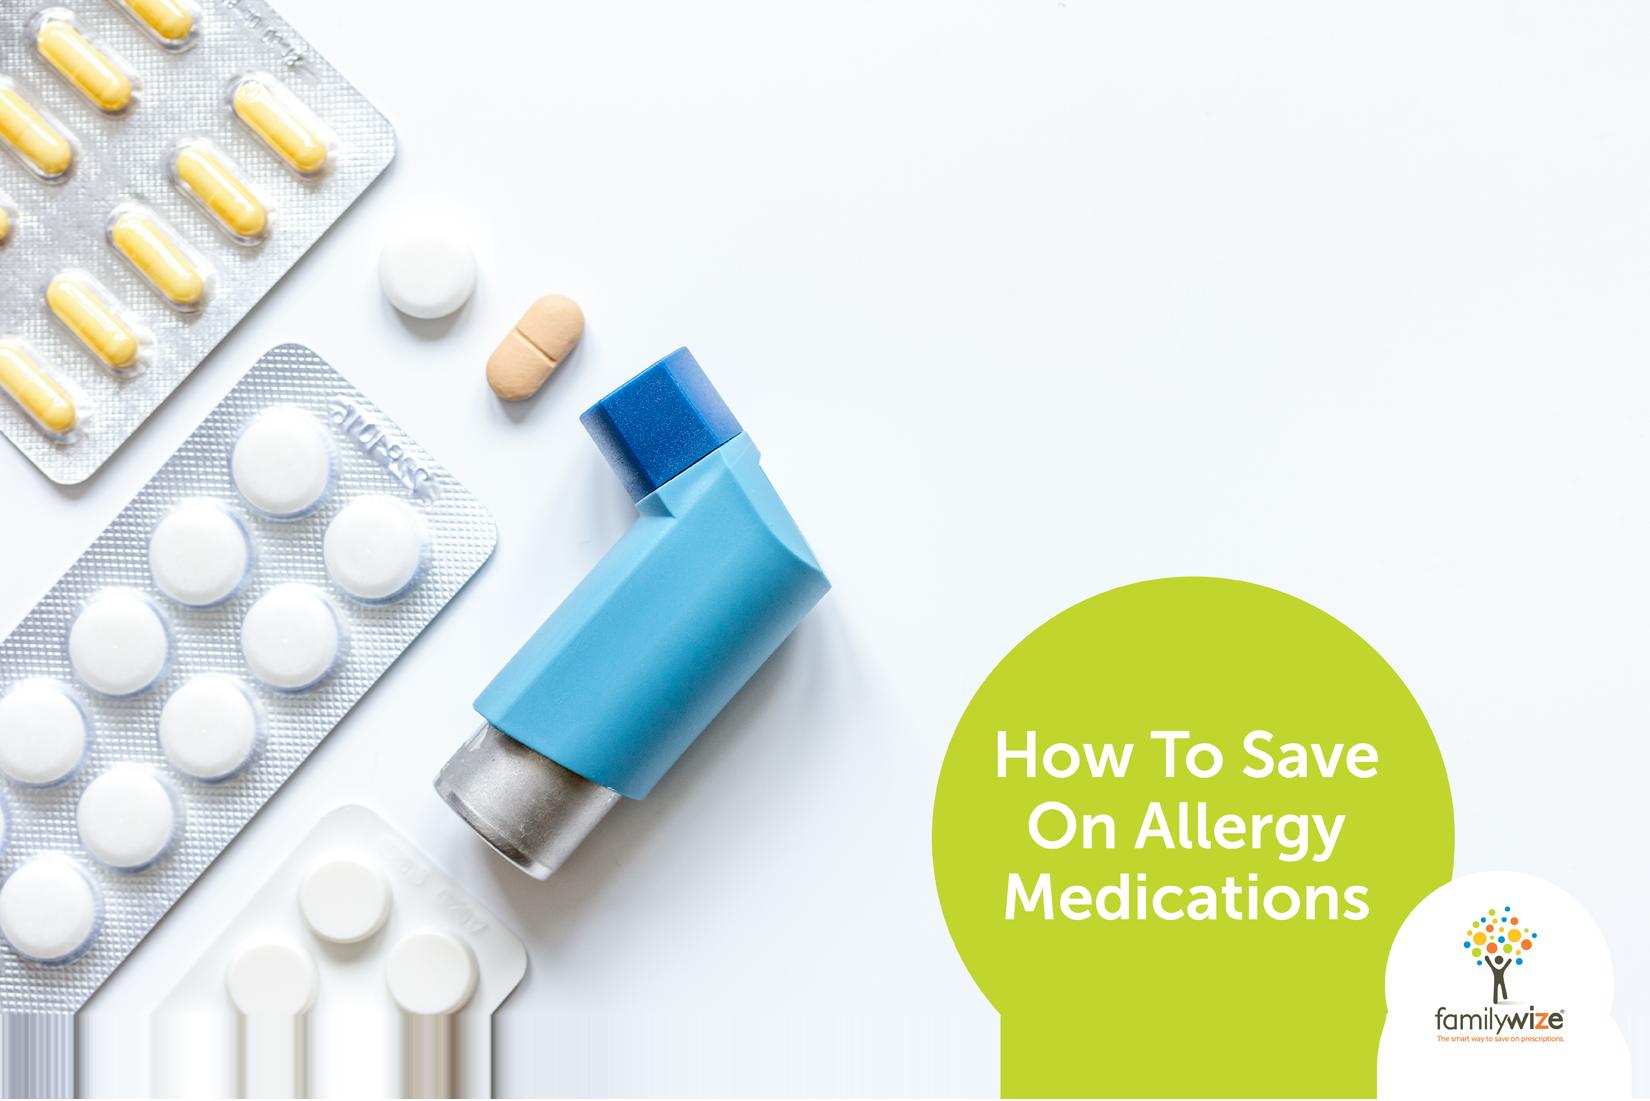 Save On Allergy Meds